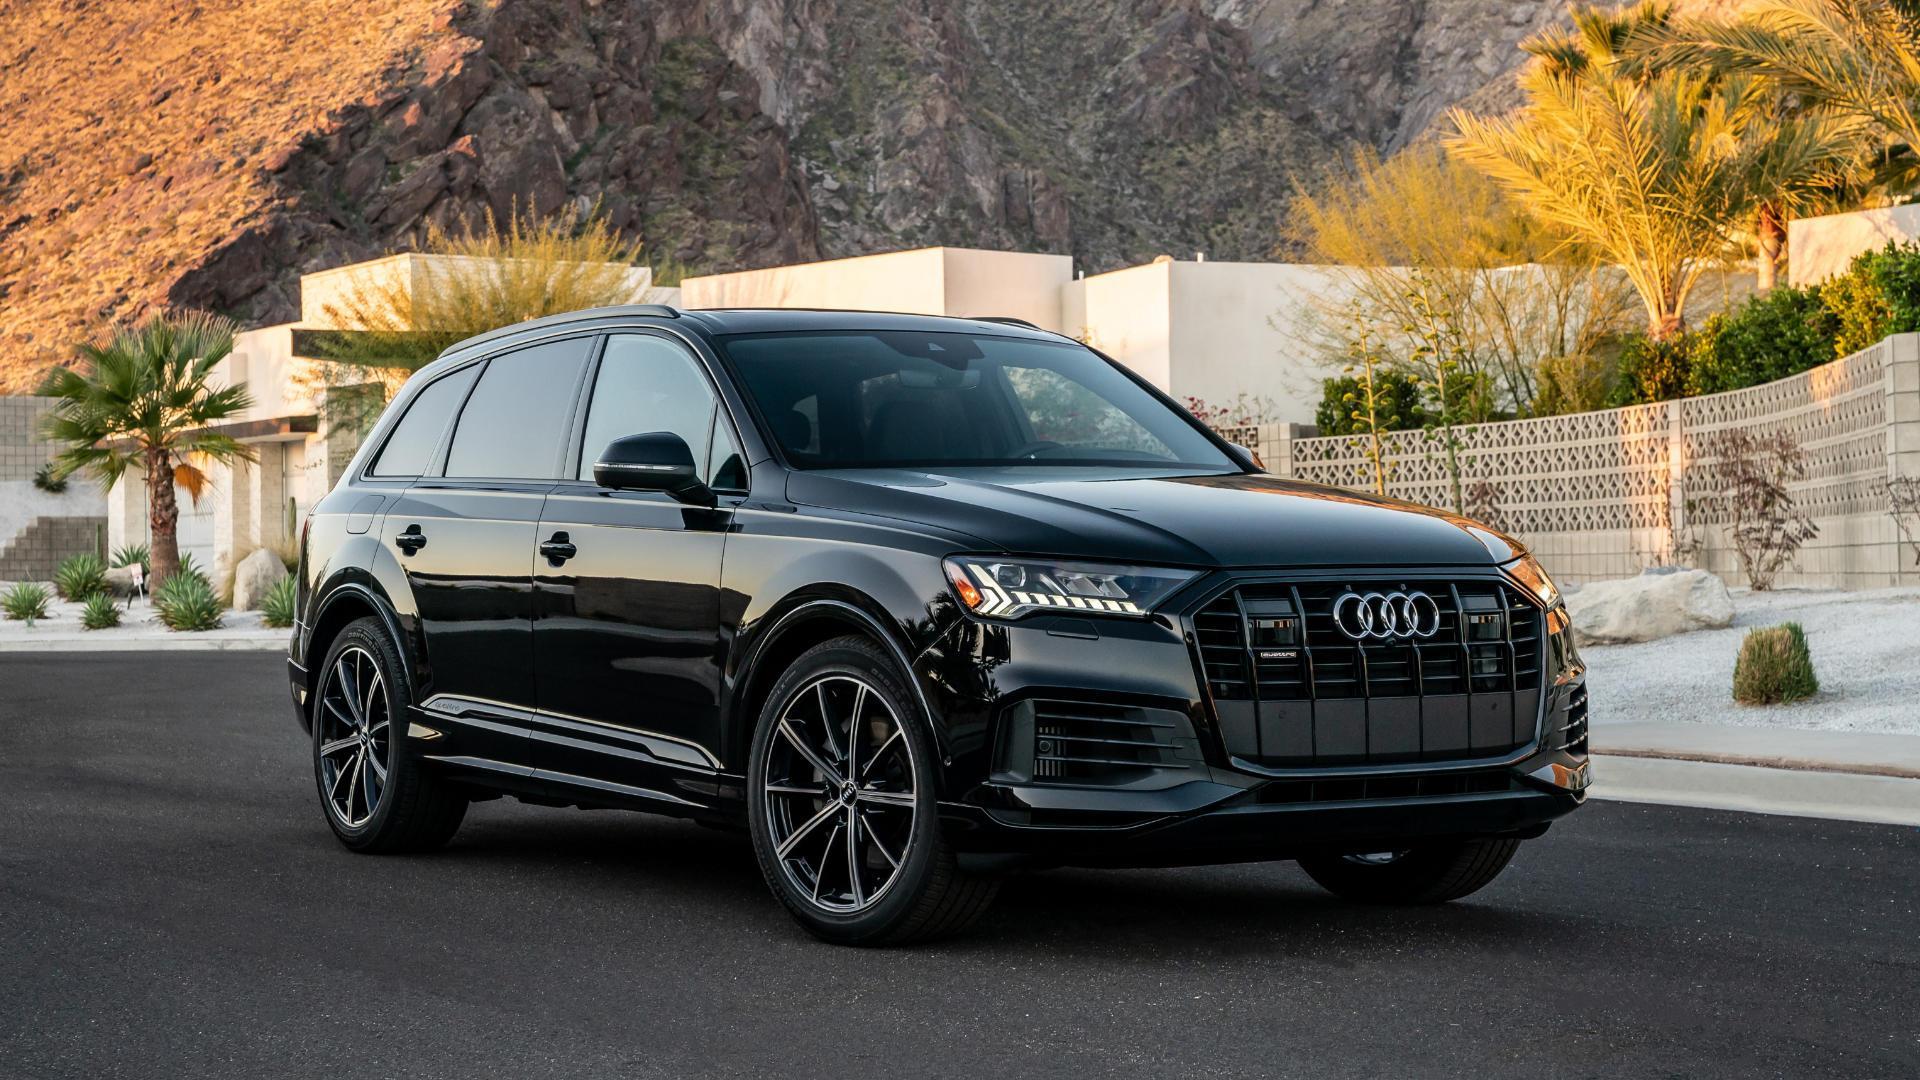 Audi SUV Models - Q2, Q3, Q5, Q7, Q8, e-tron and more